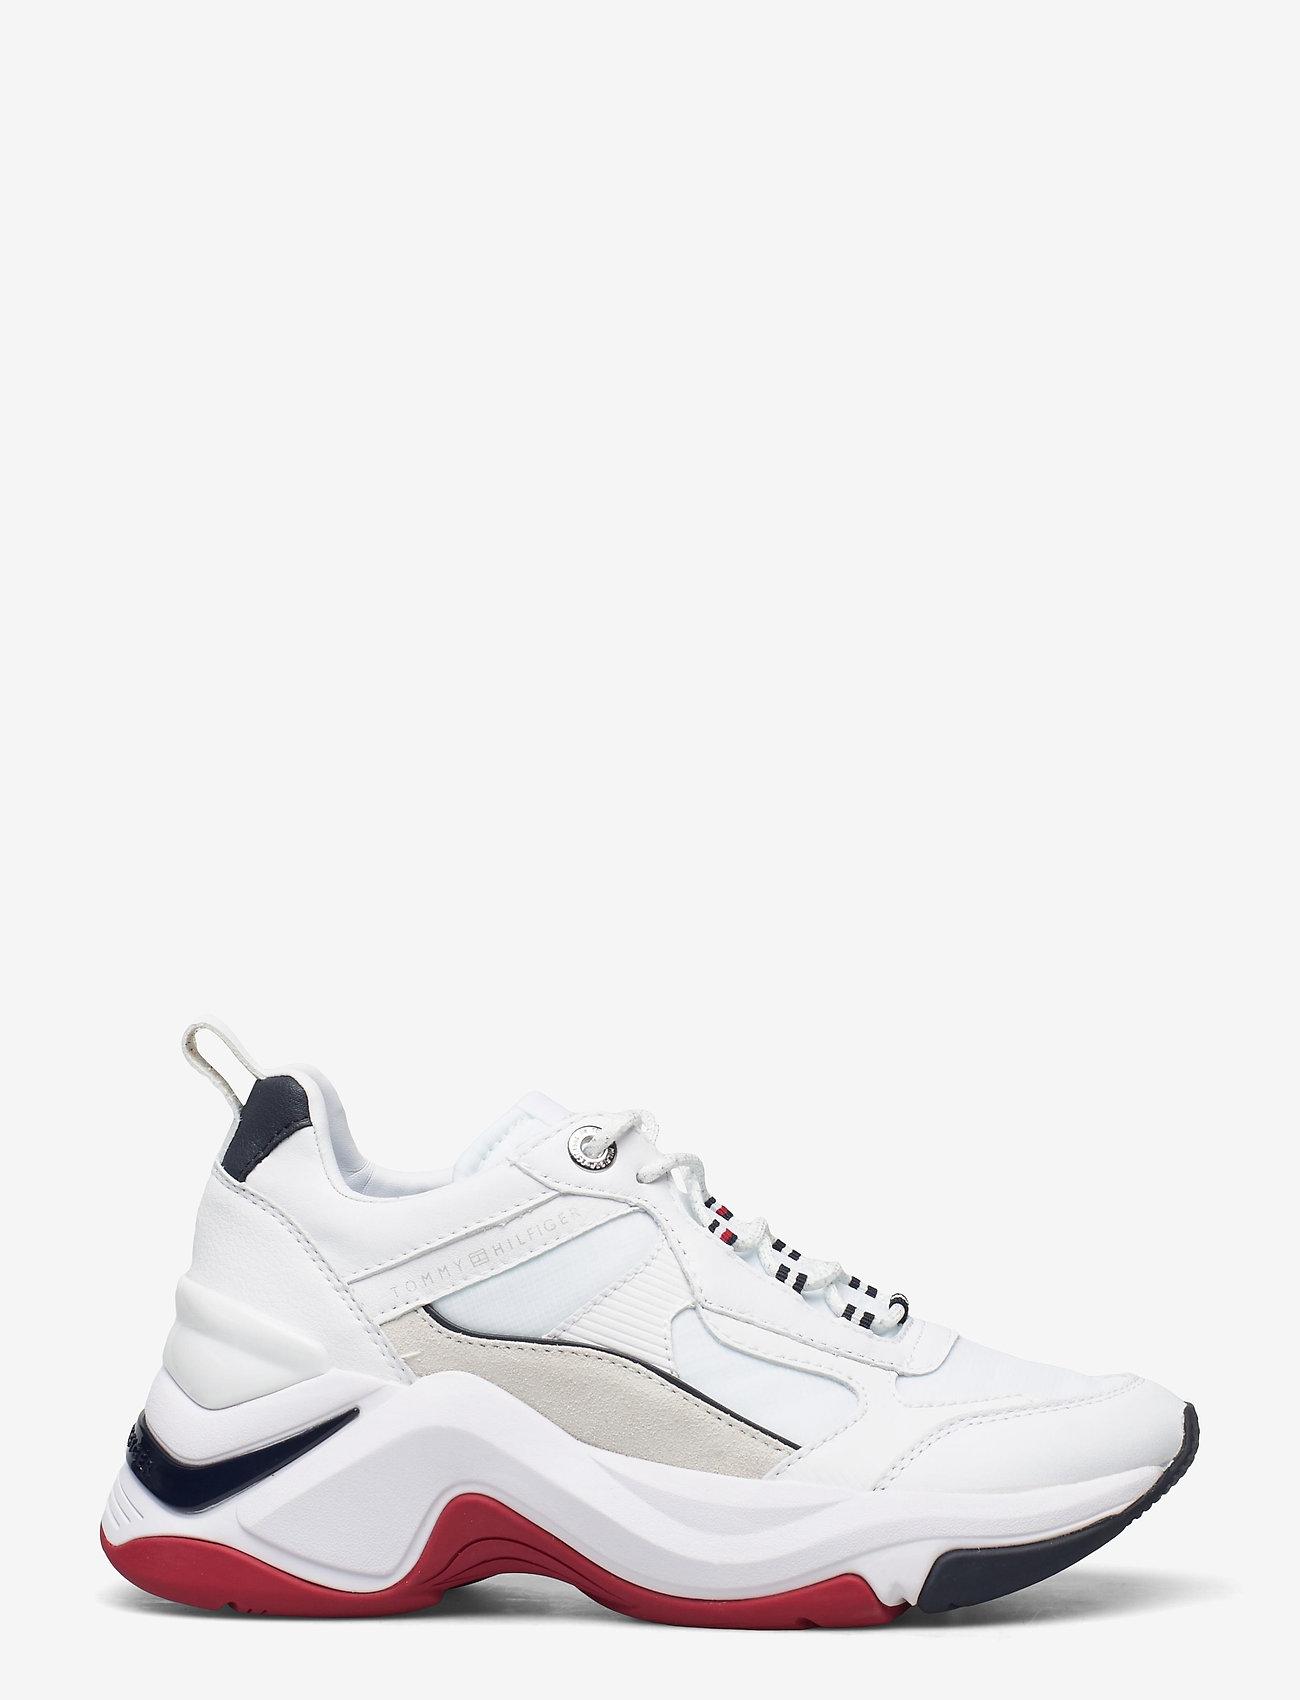 Tommy Hilfiger - FASHION WEDGE SNEAKER - chunky sneakers - rwb - 1